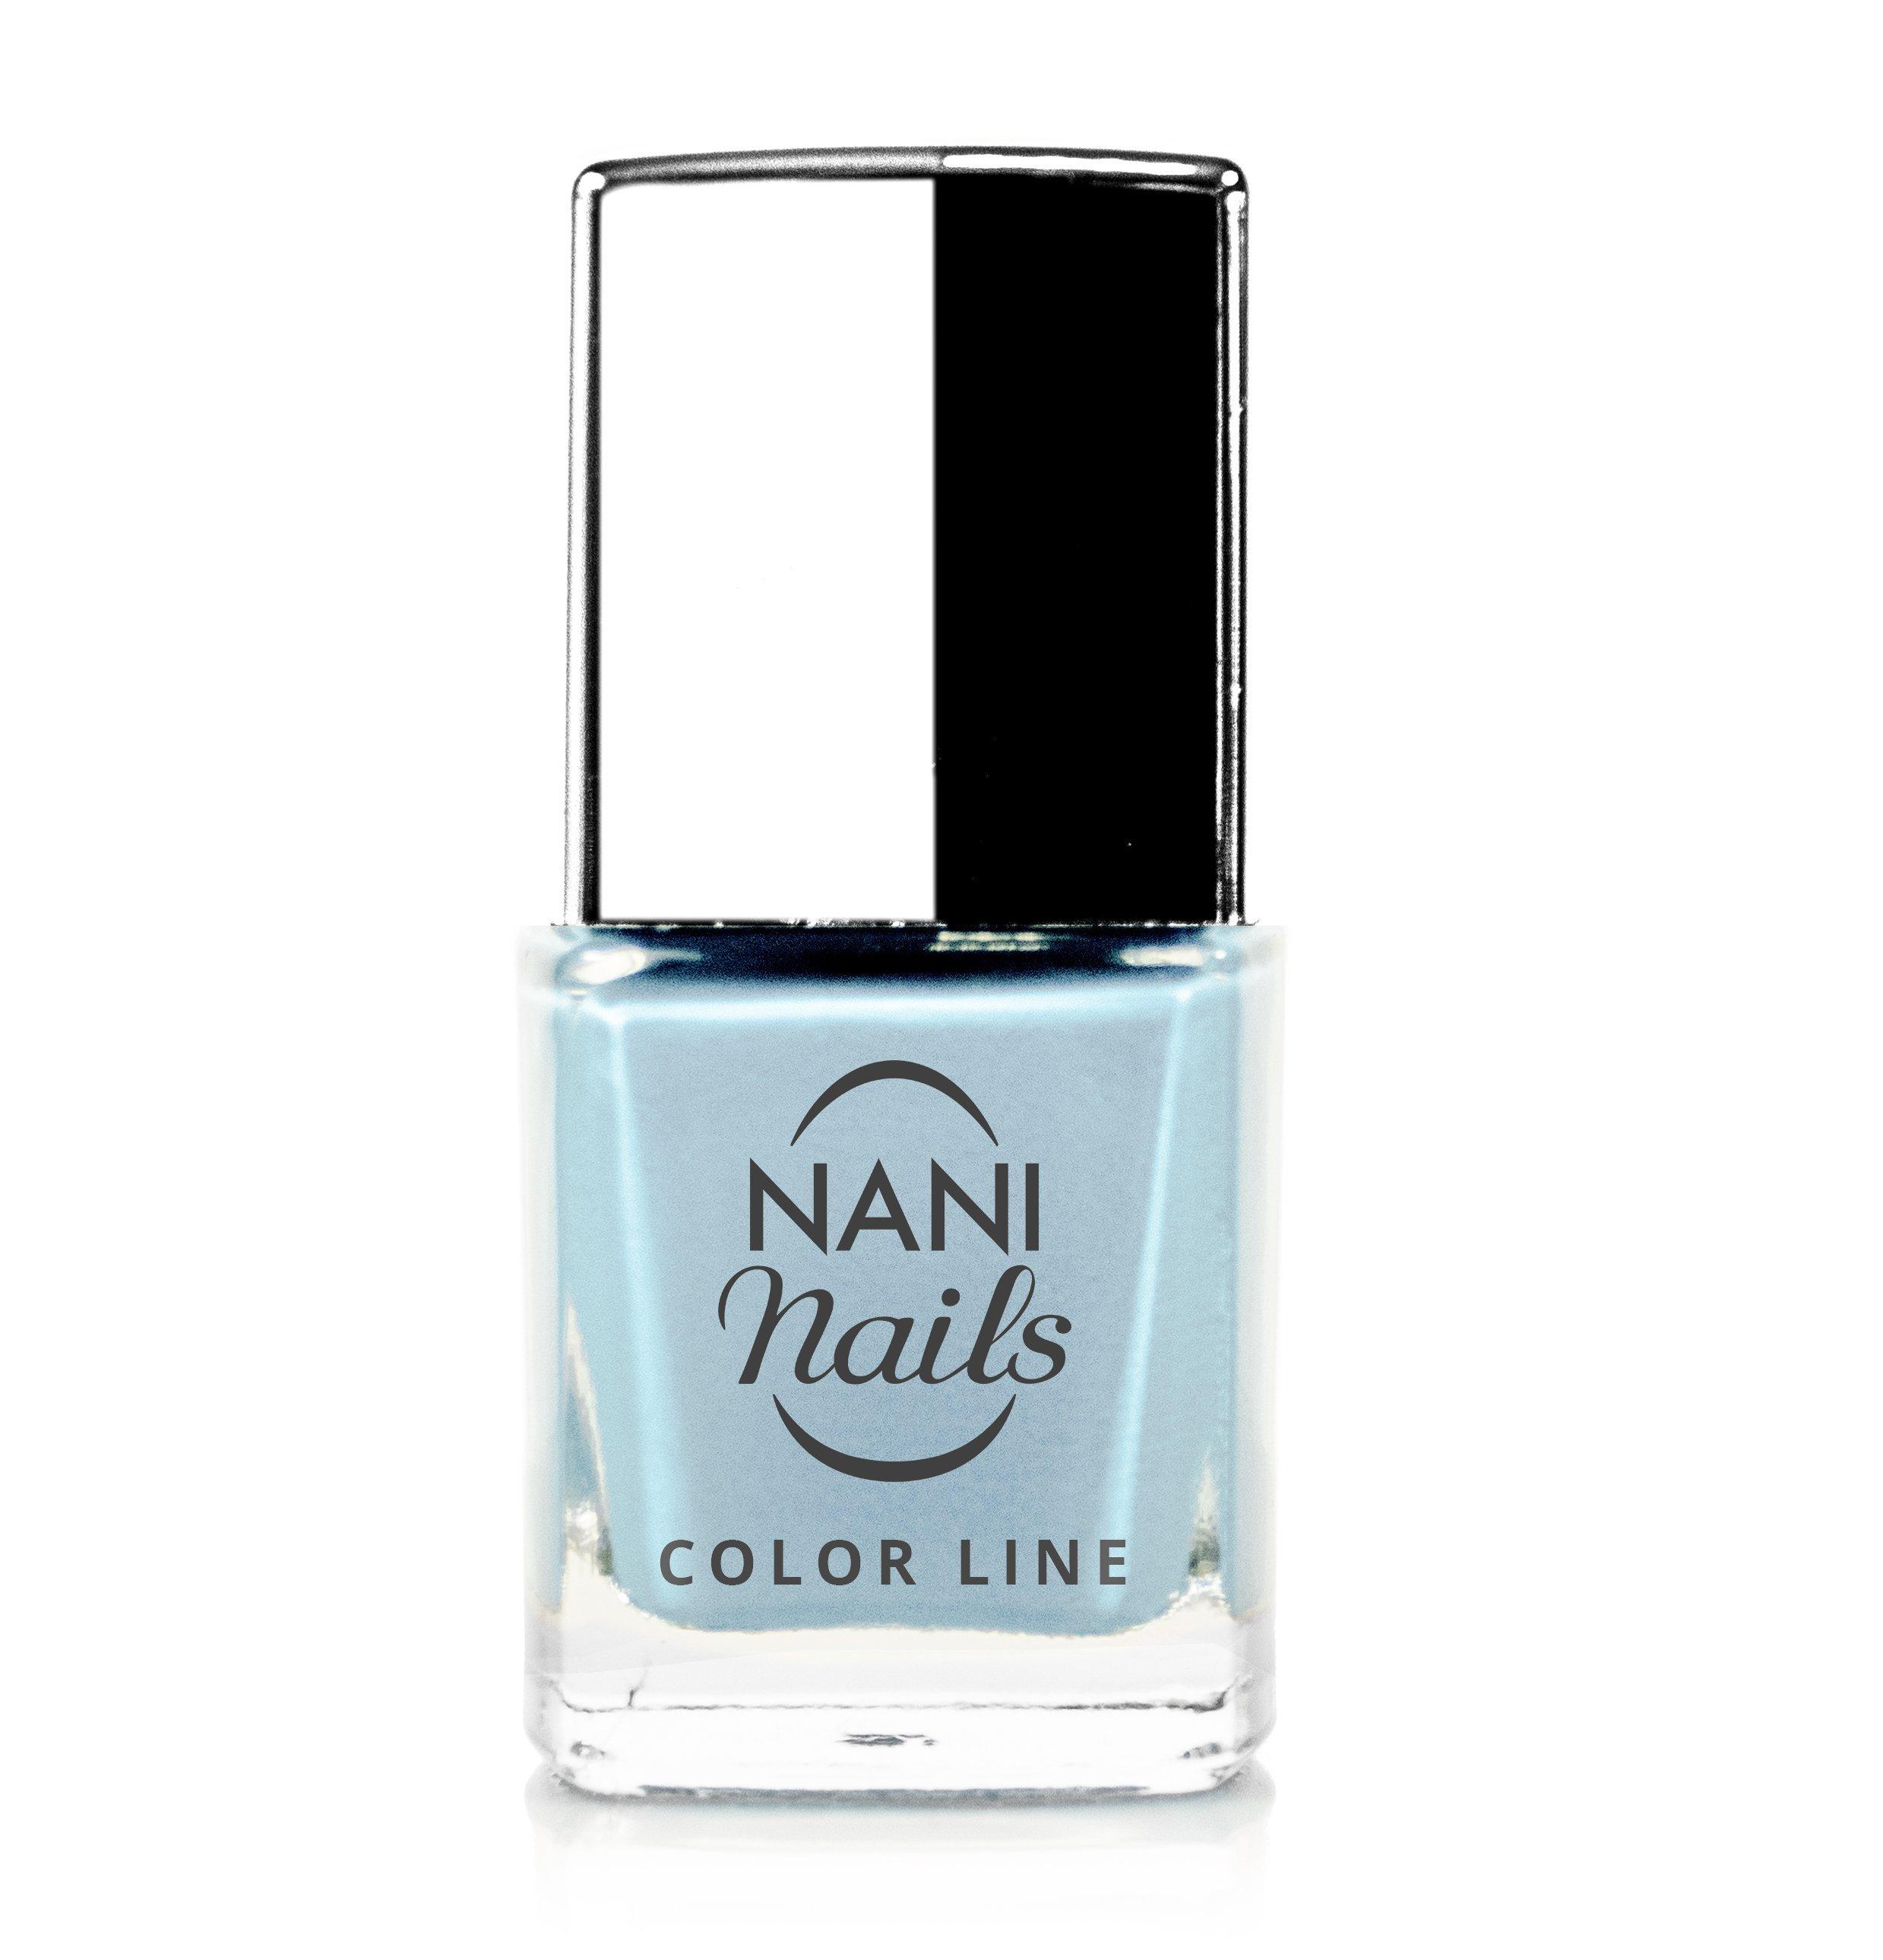 NANI lak Color Line 9 ml - 106